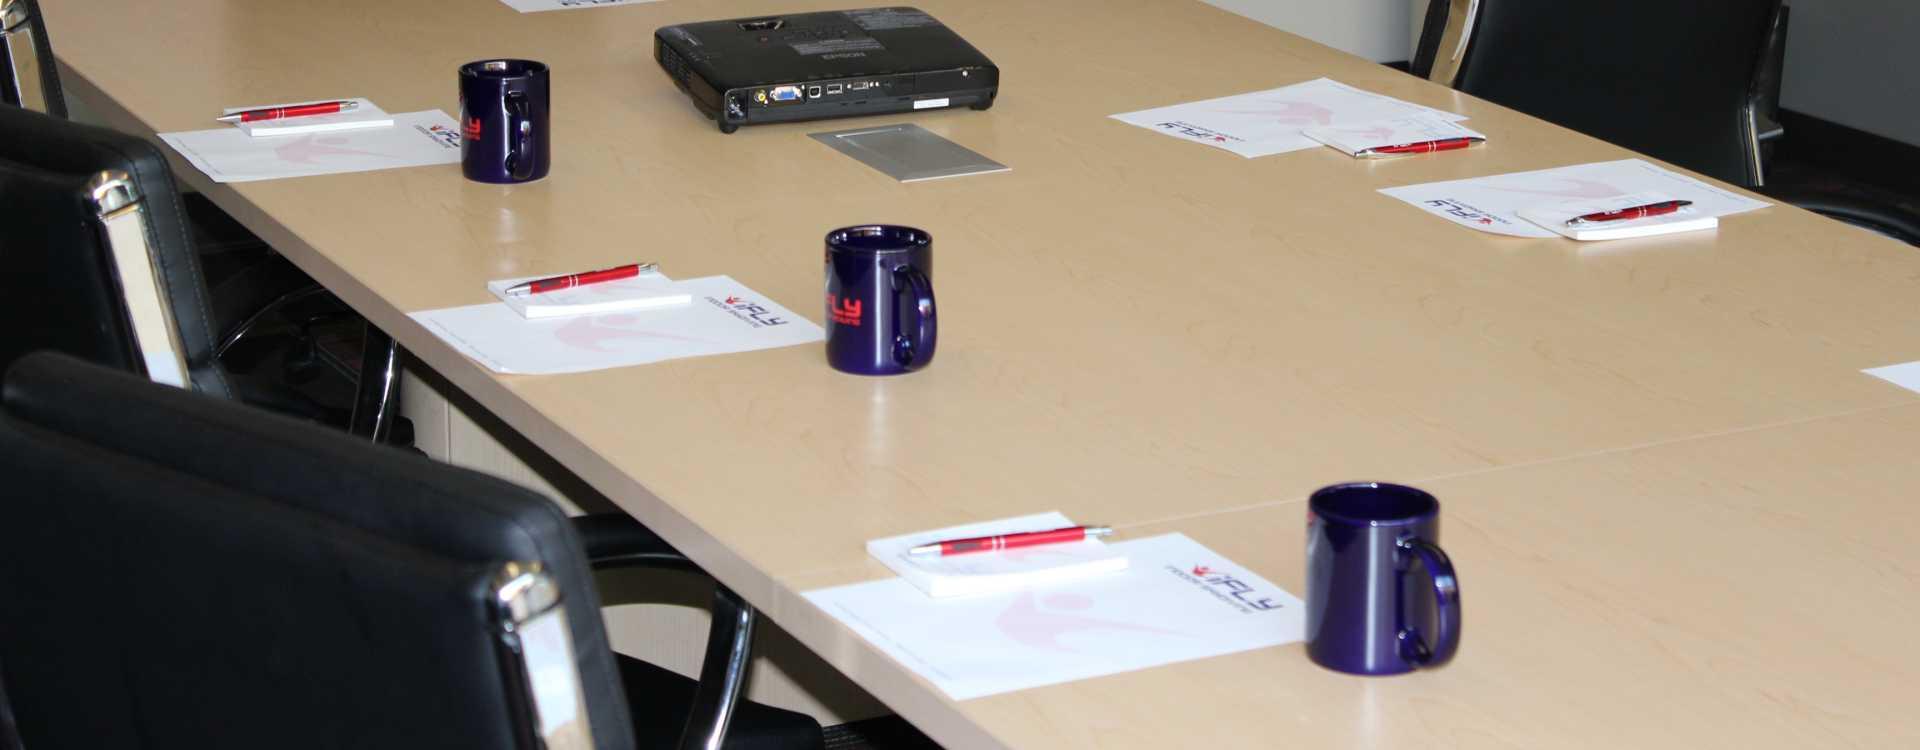 meeting-facility-iFLY_Meeting_Facility-4.JPG